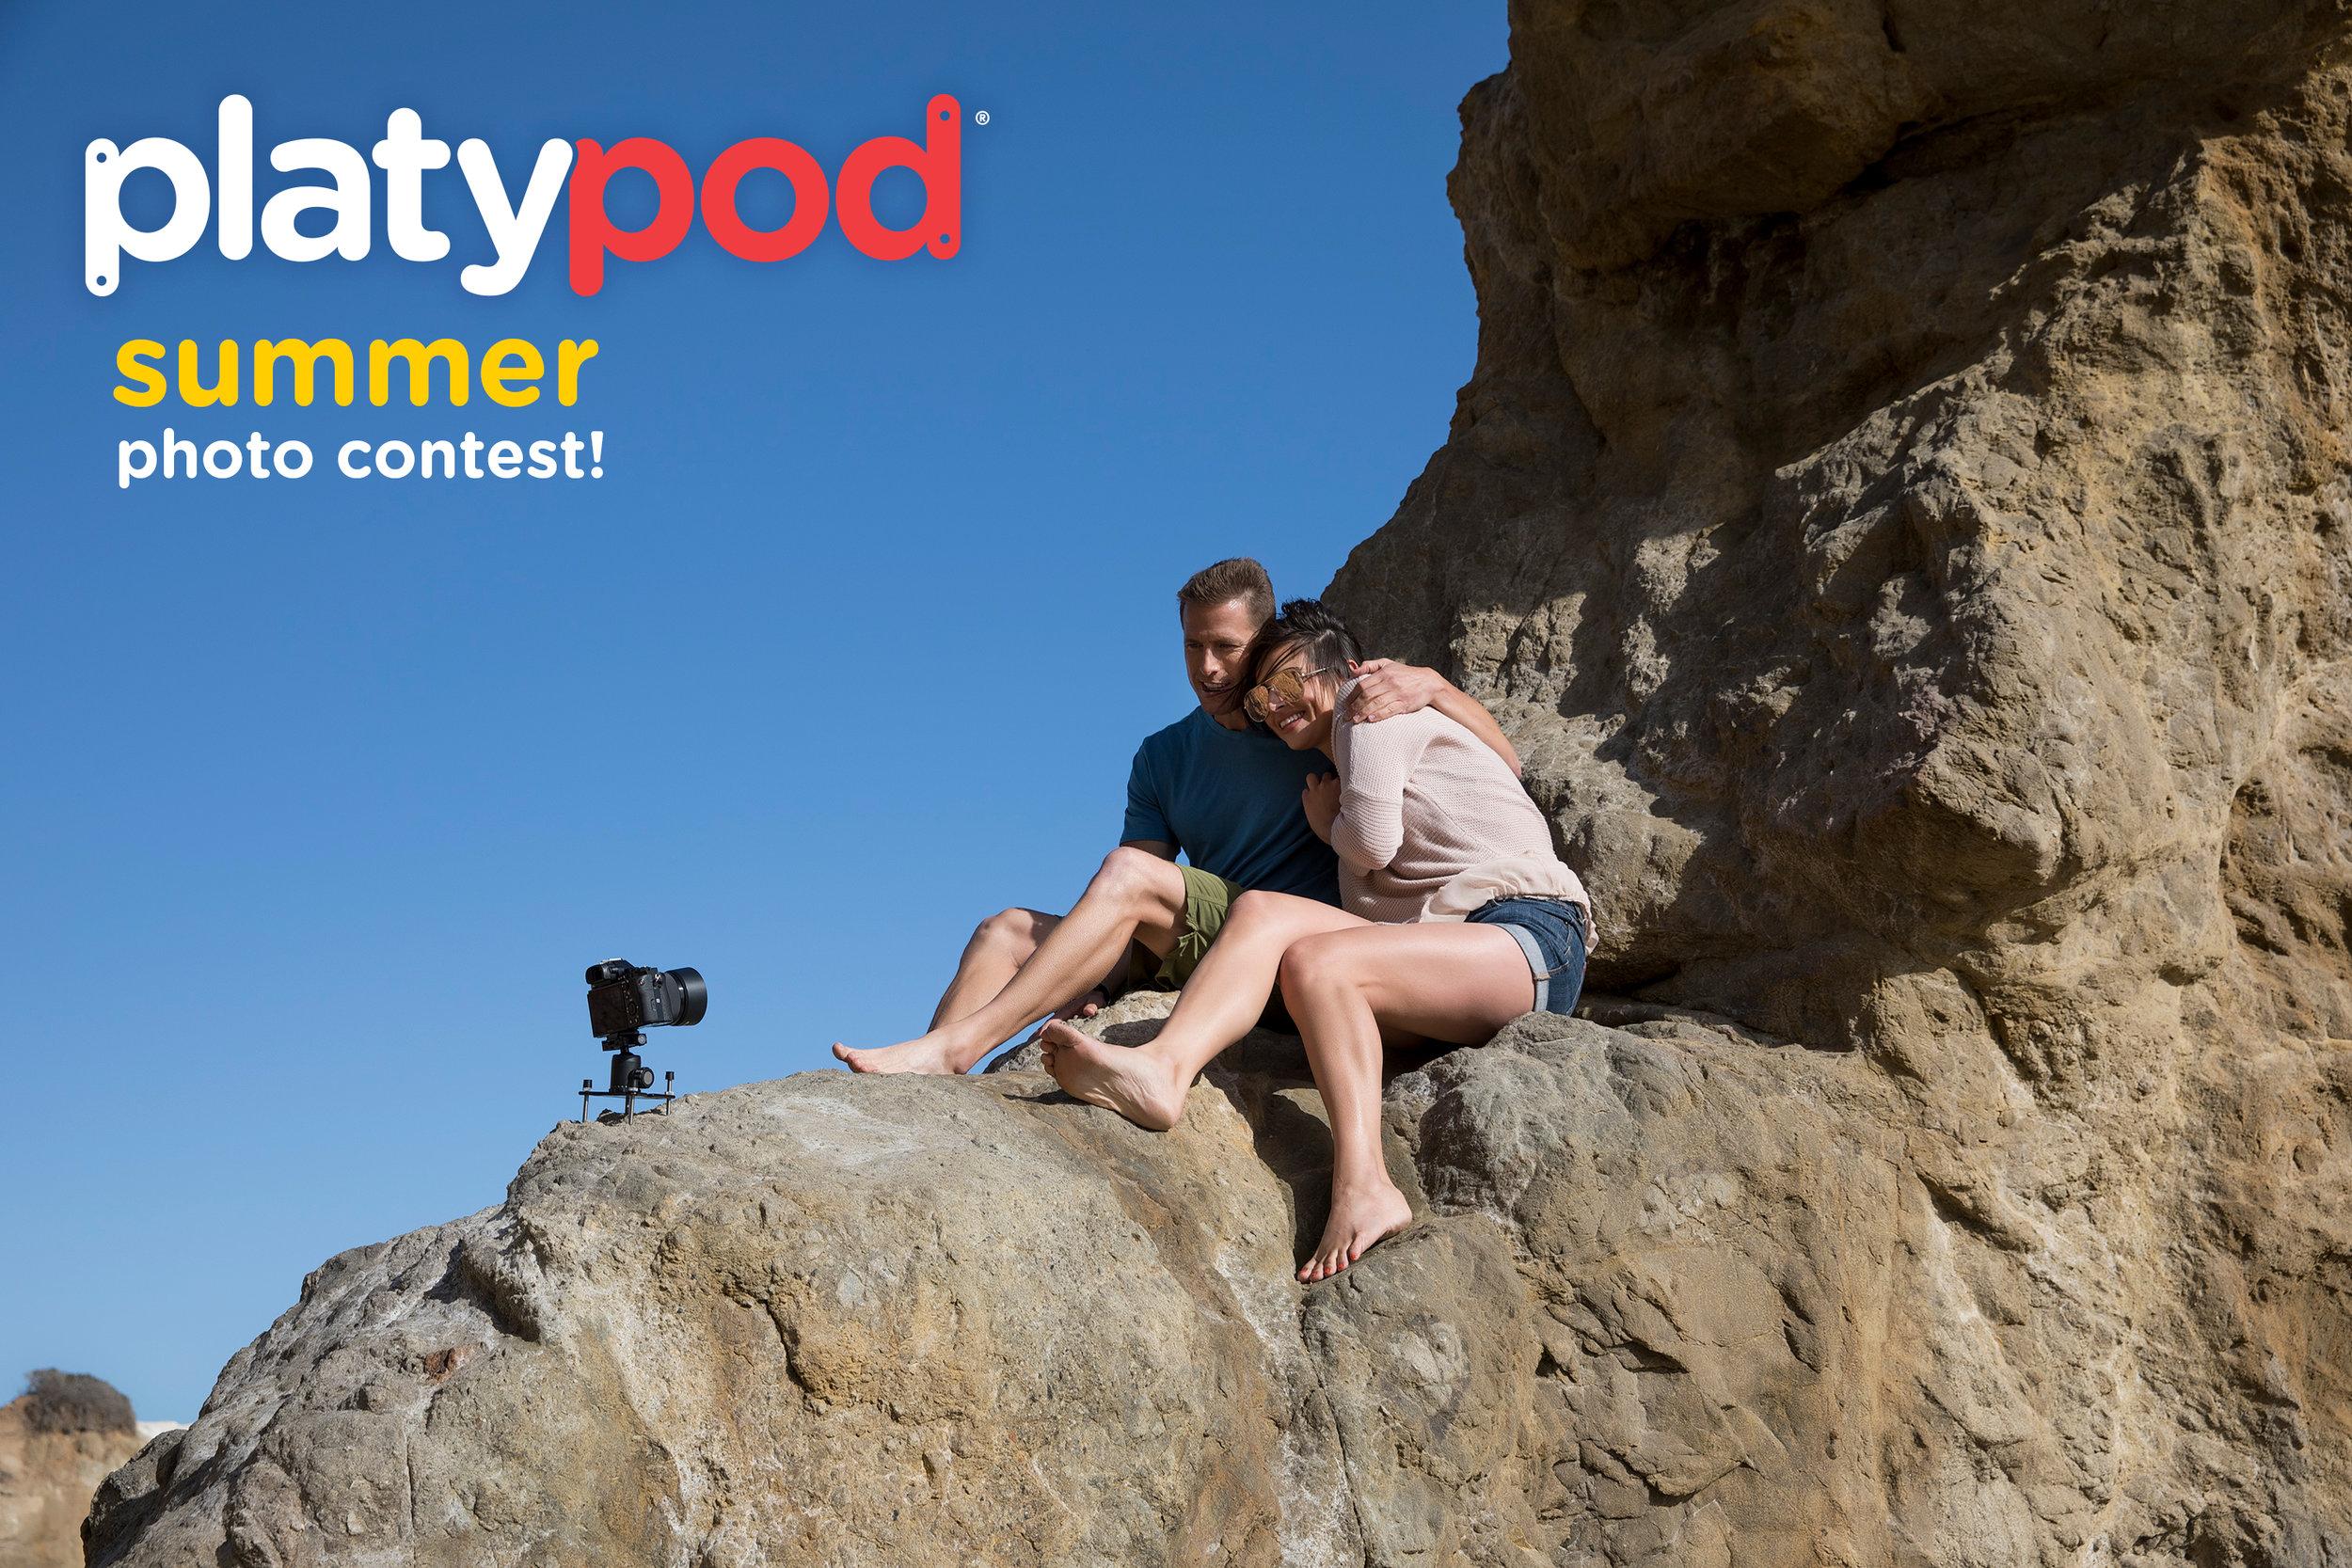 Platypod Summer Photo Contest